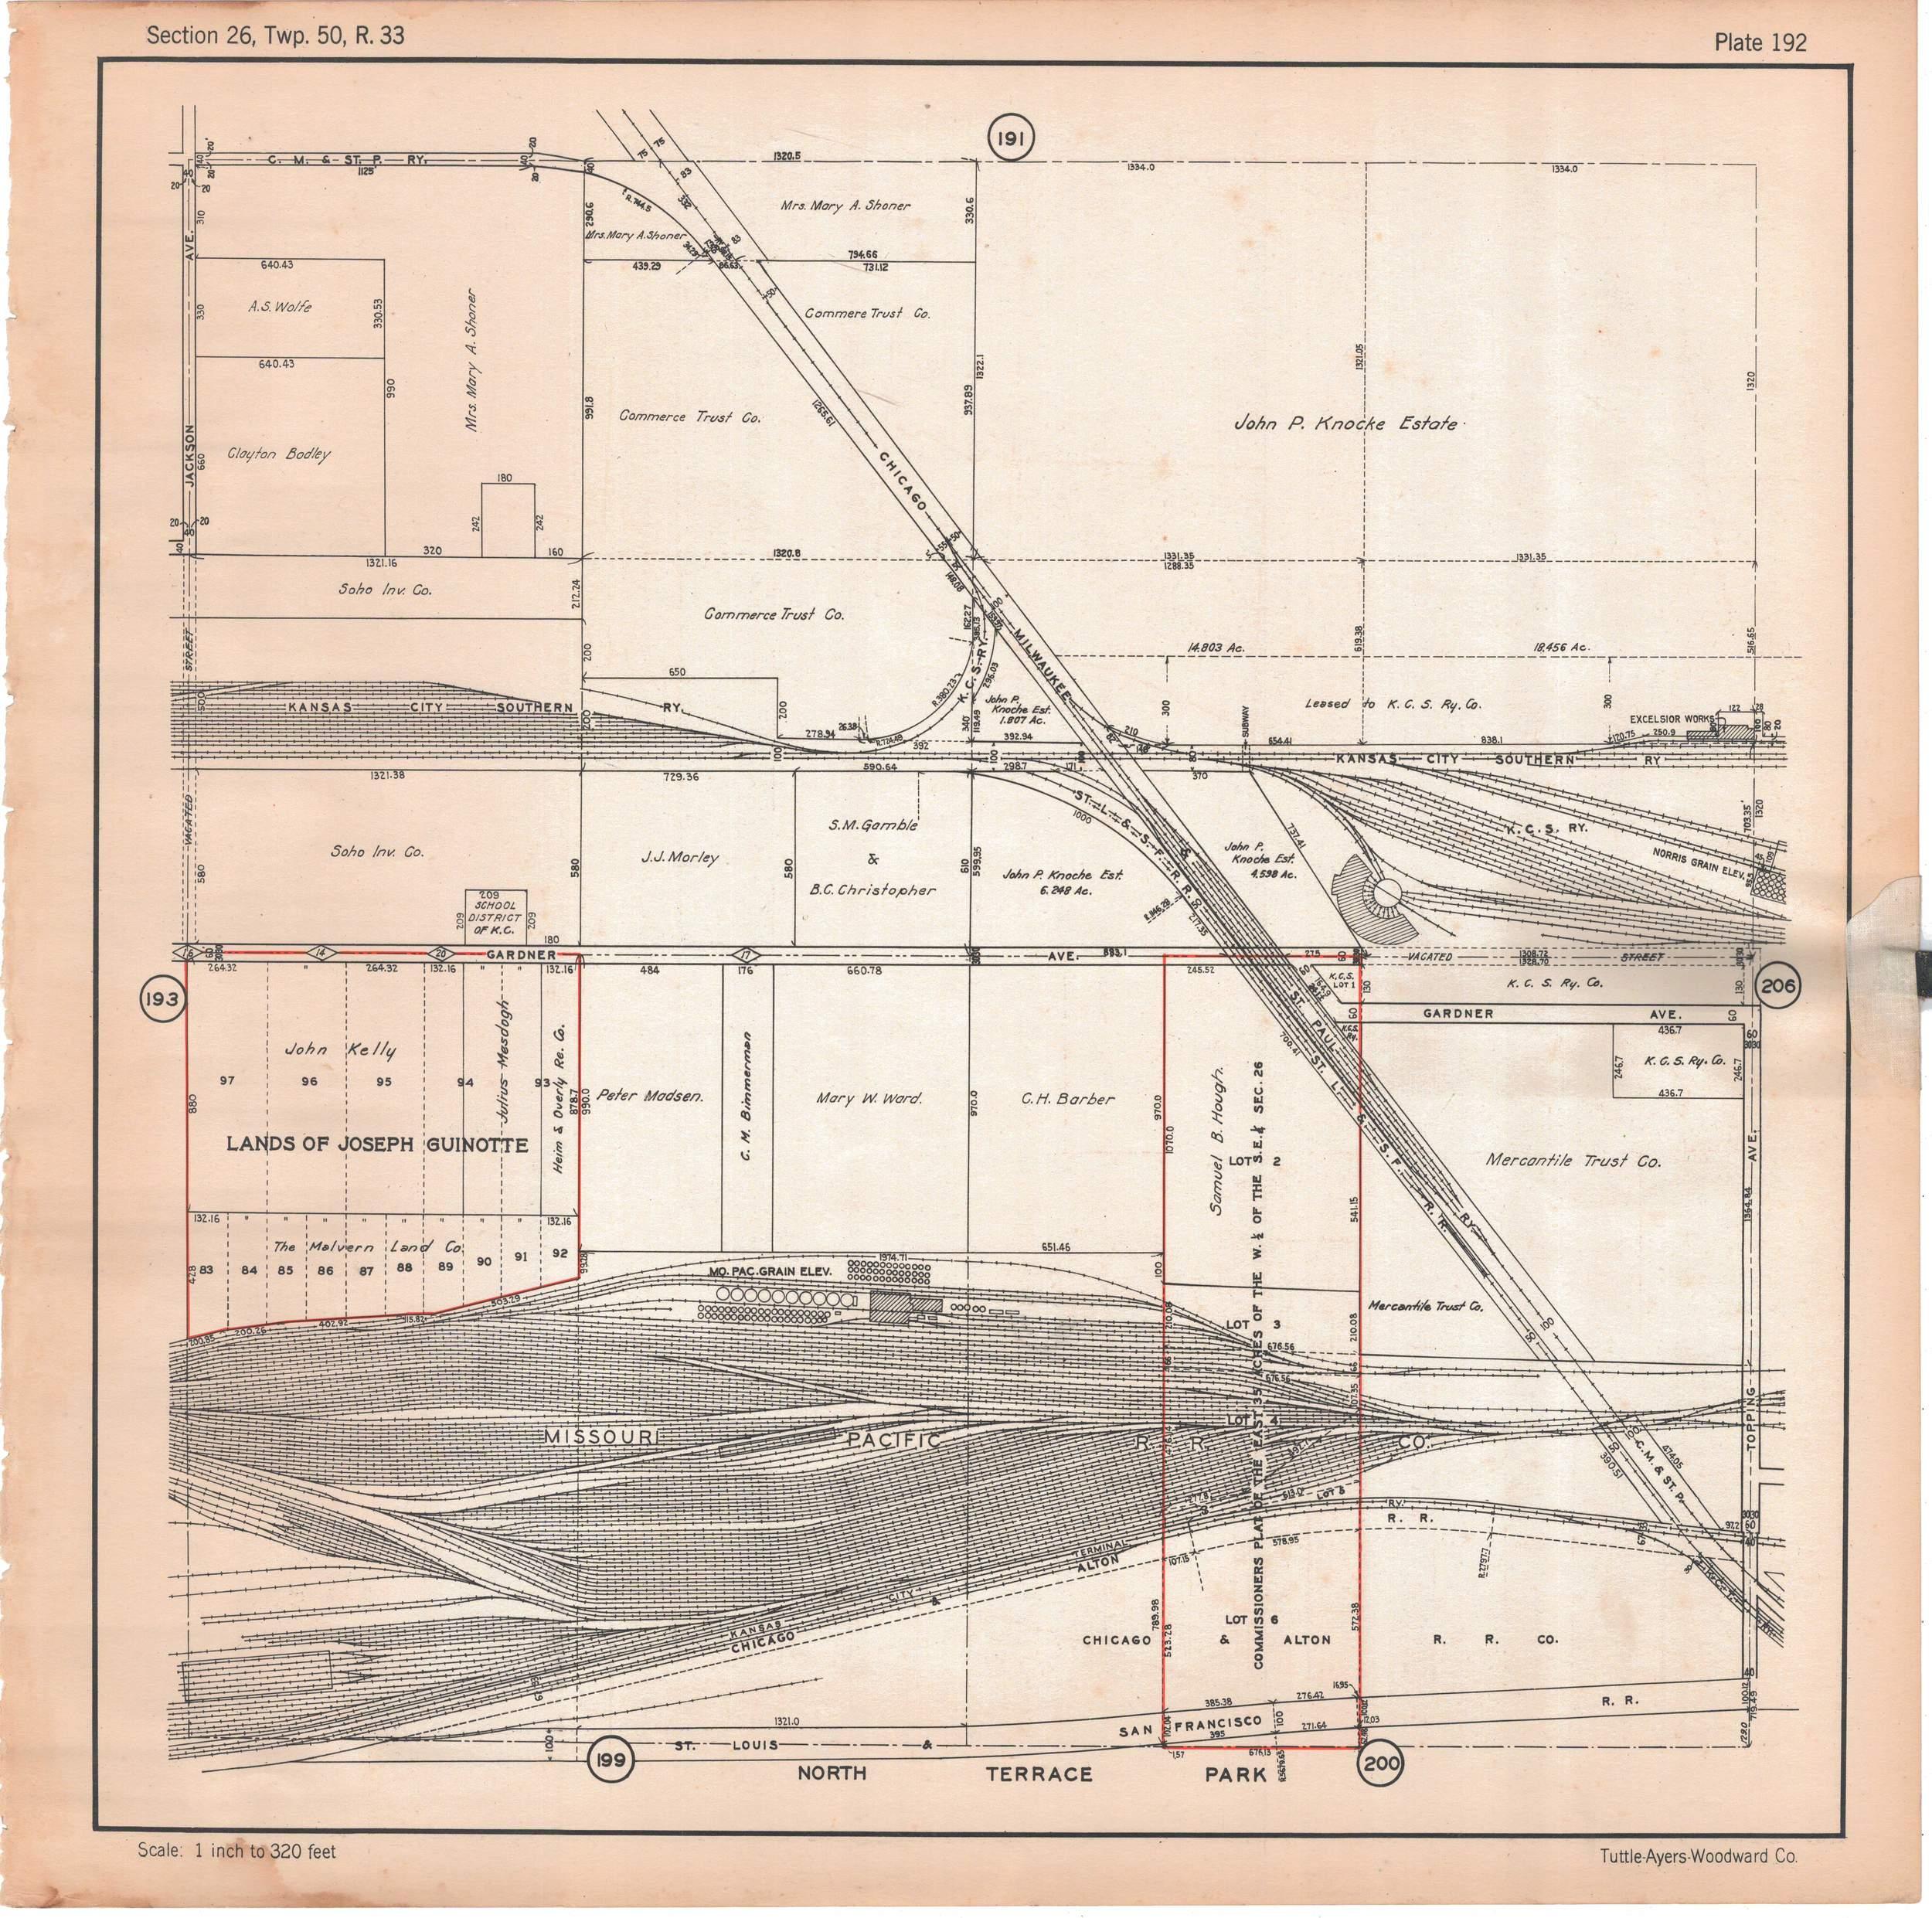 1925 TUTTLE_AYERS_Plate_192.JPG